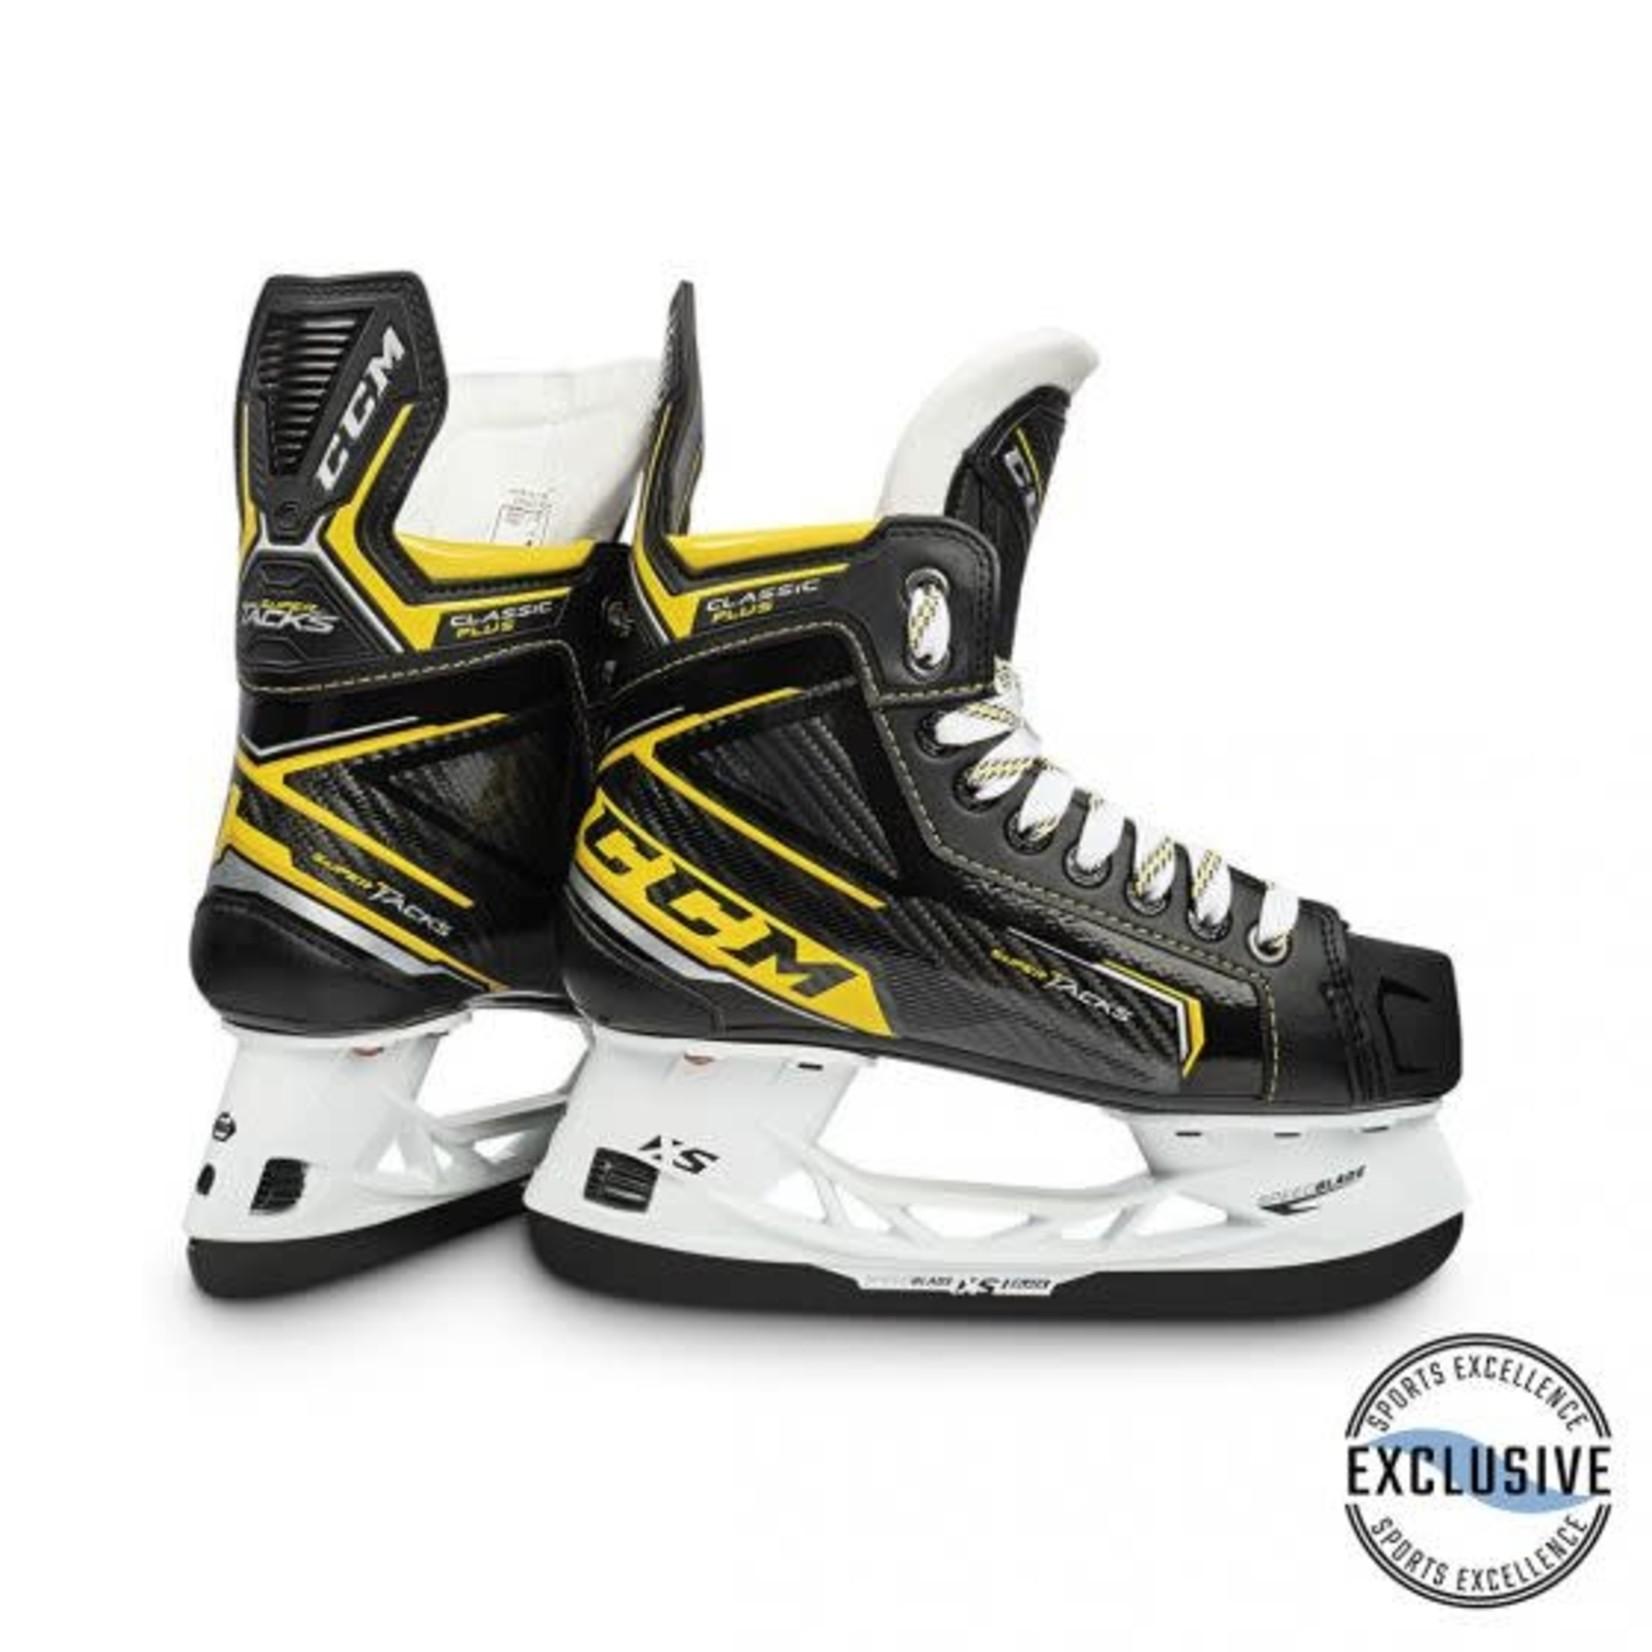 CCM CCM Hockey Skates, Super Tacks Classic Plus, Intermediate